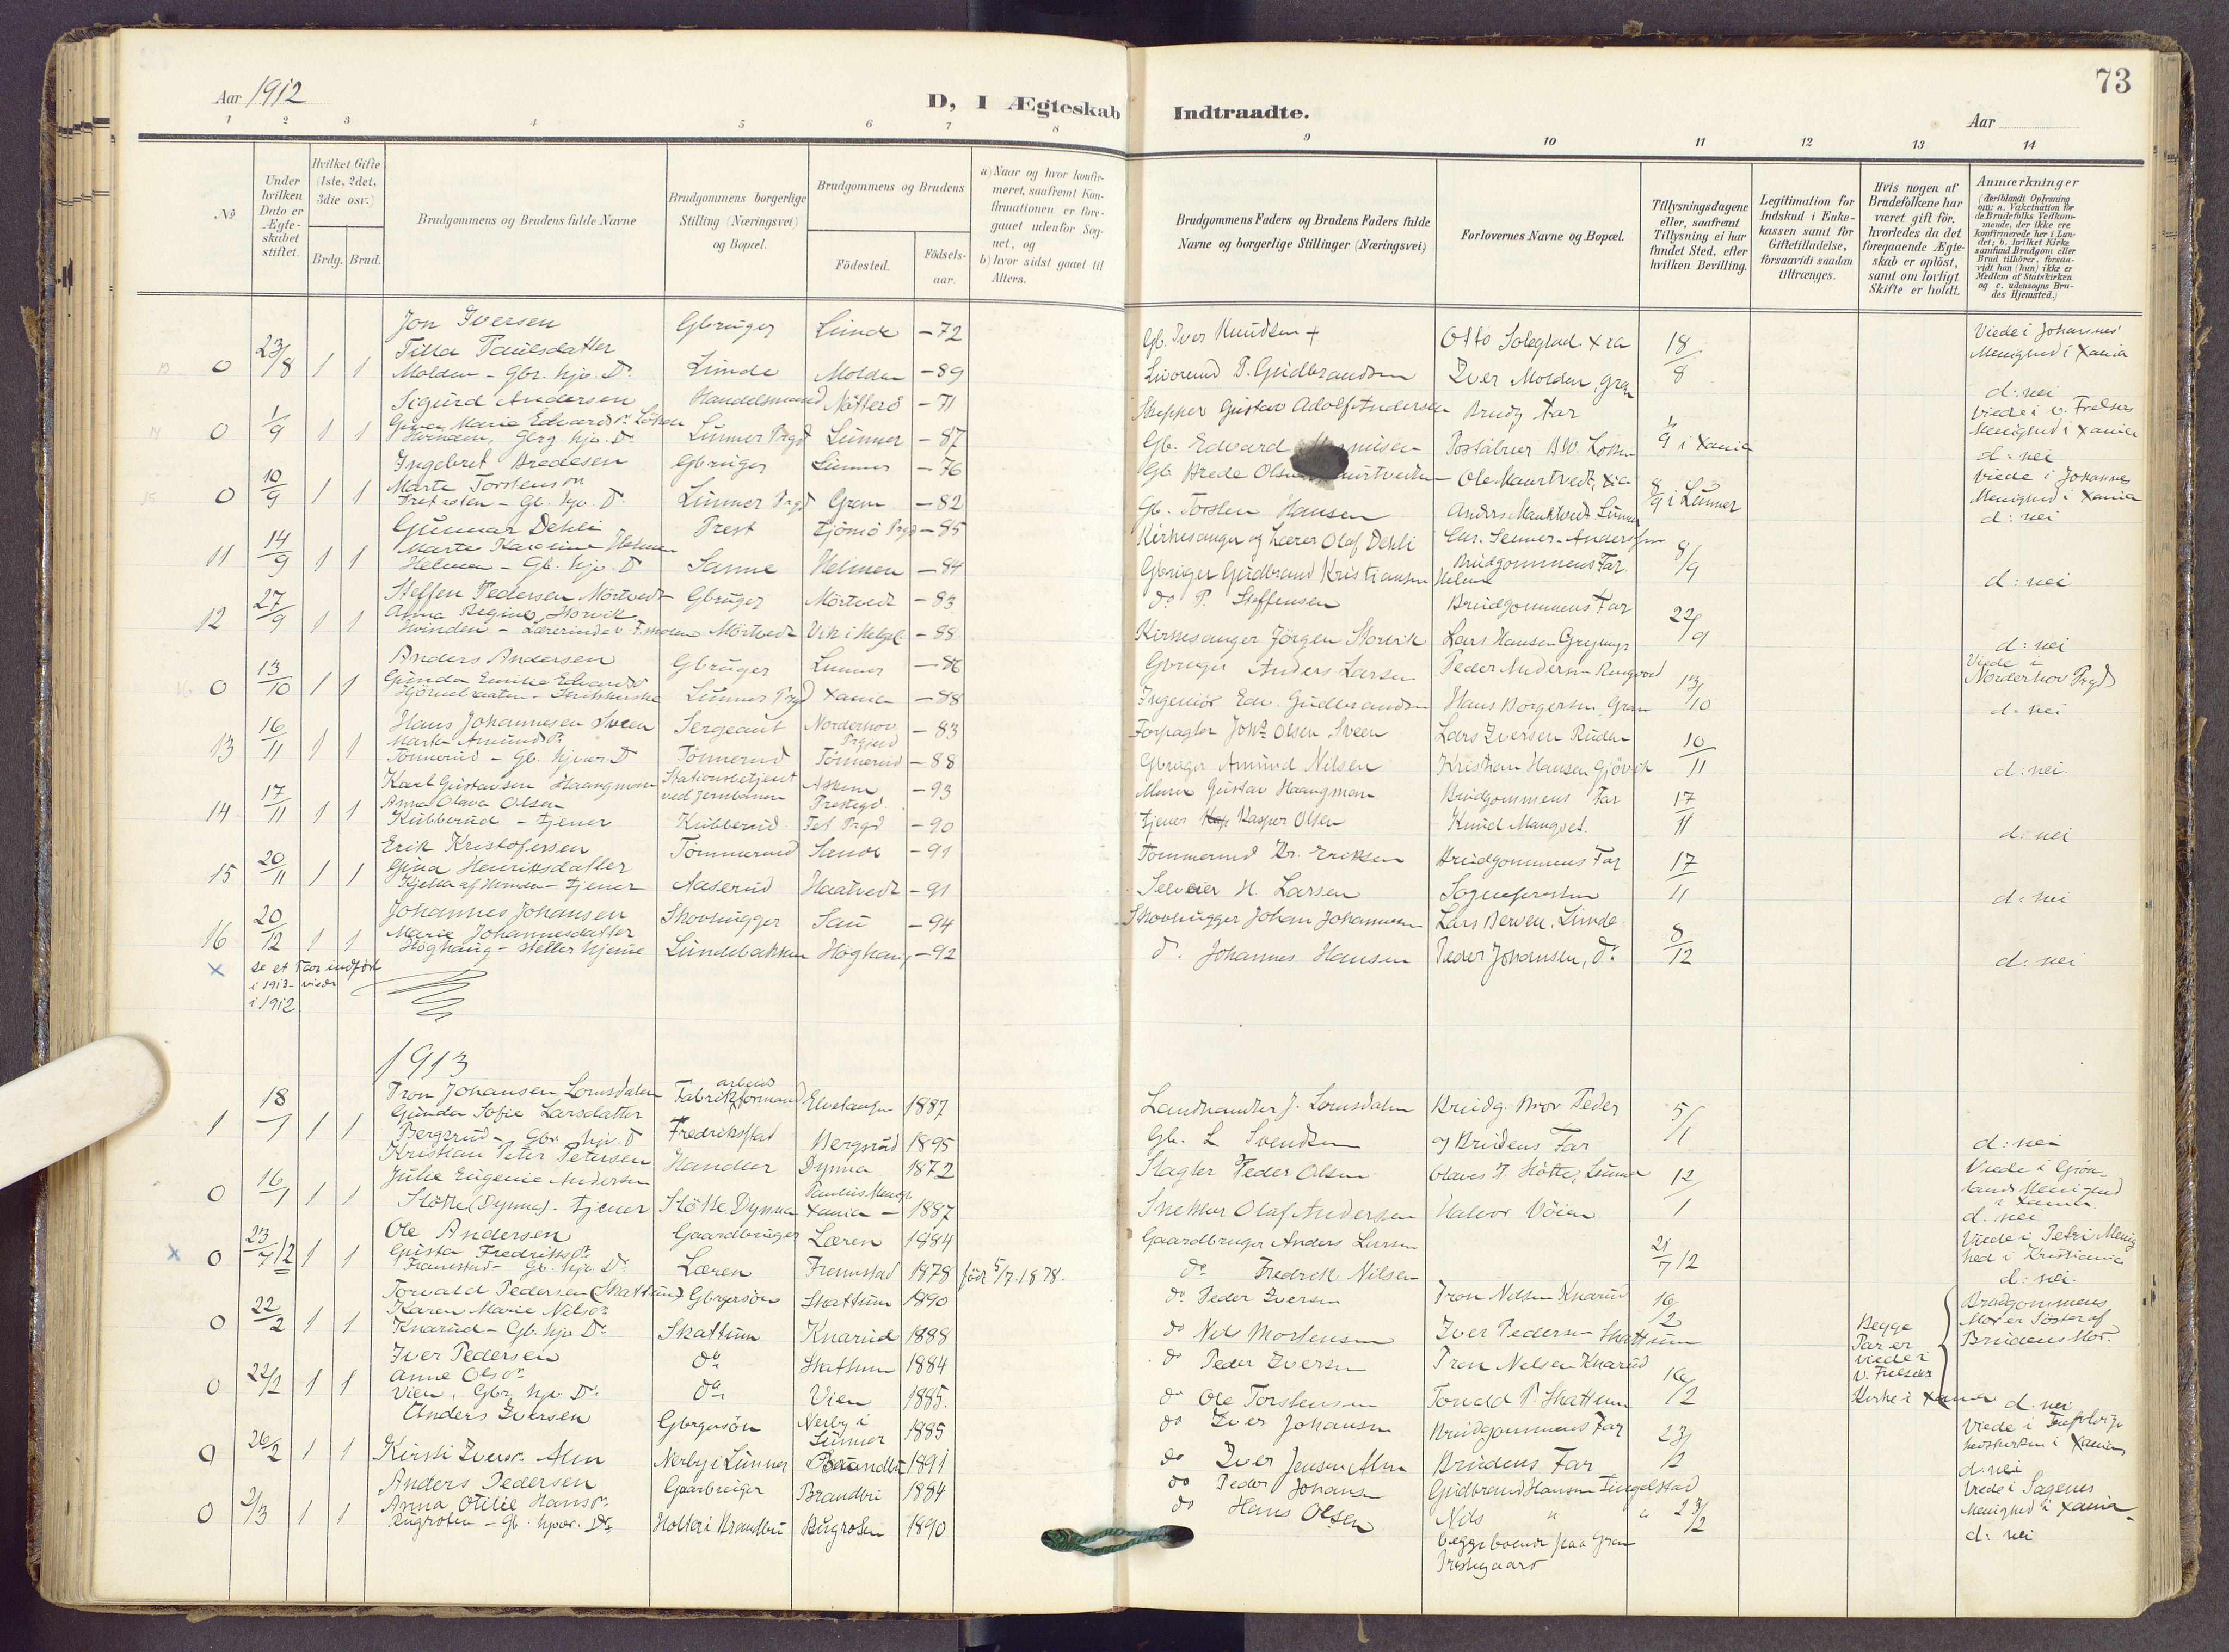 SAH, Gran prestekontor, Ministerialbok nr. 22, 1908-1918, s. 73